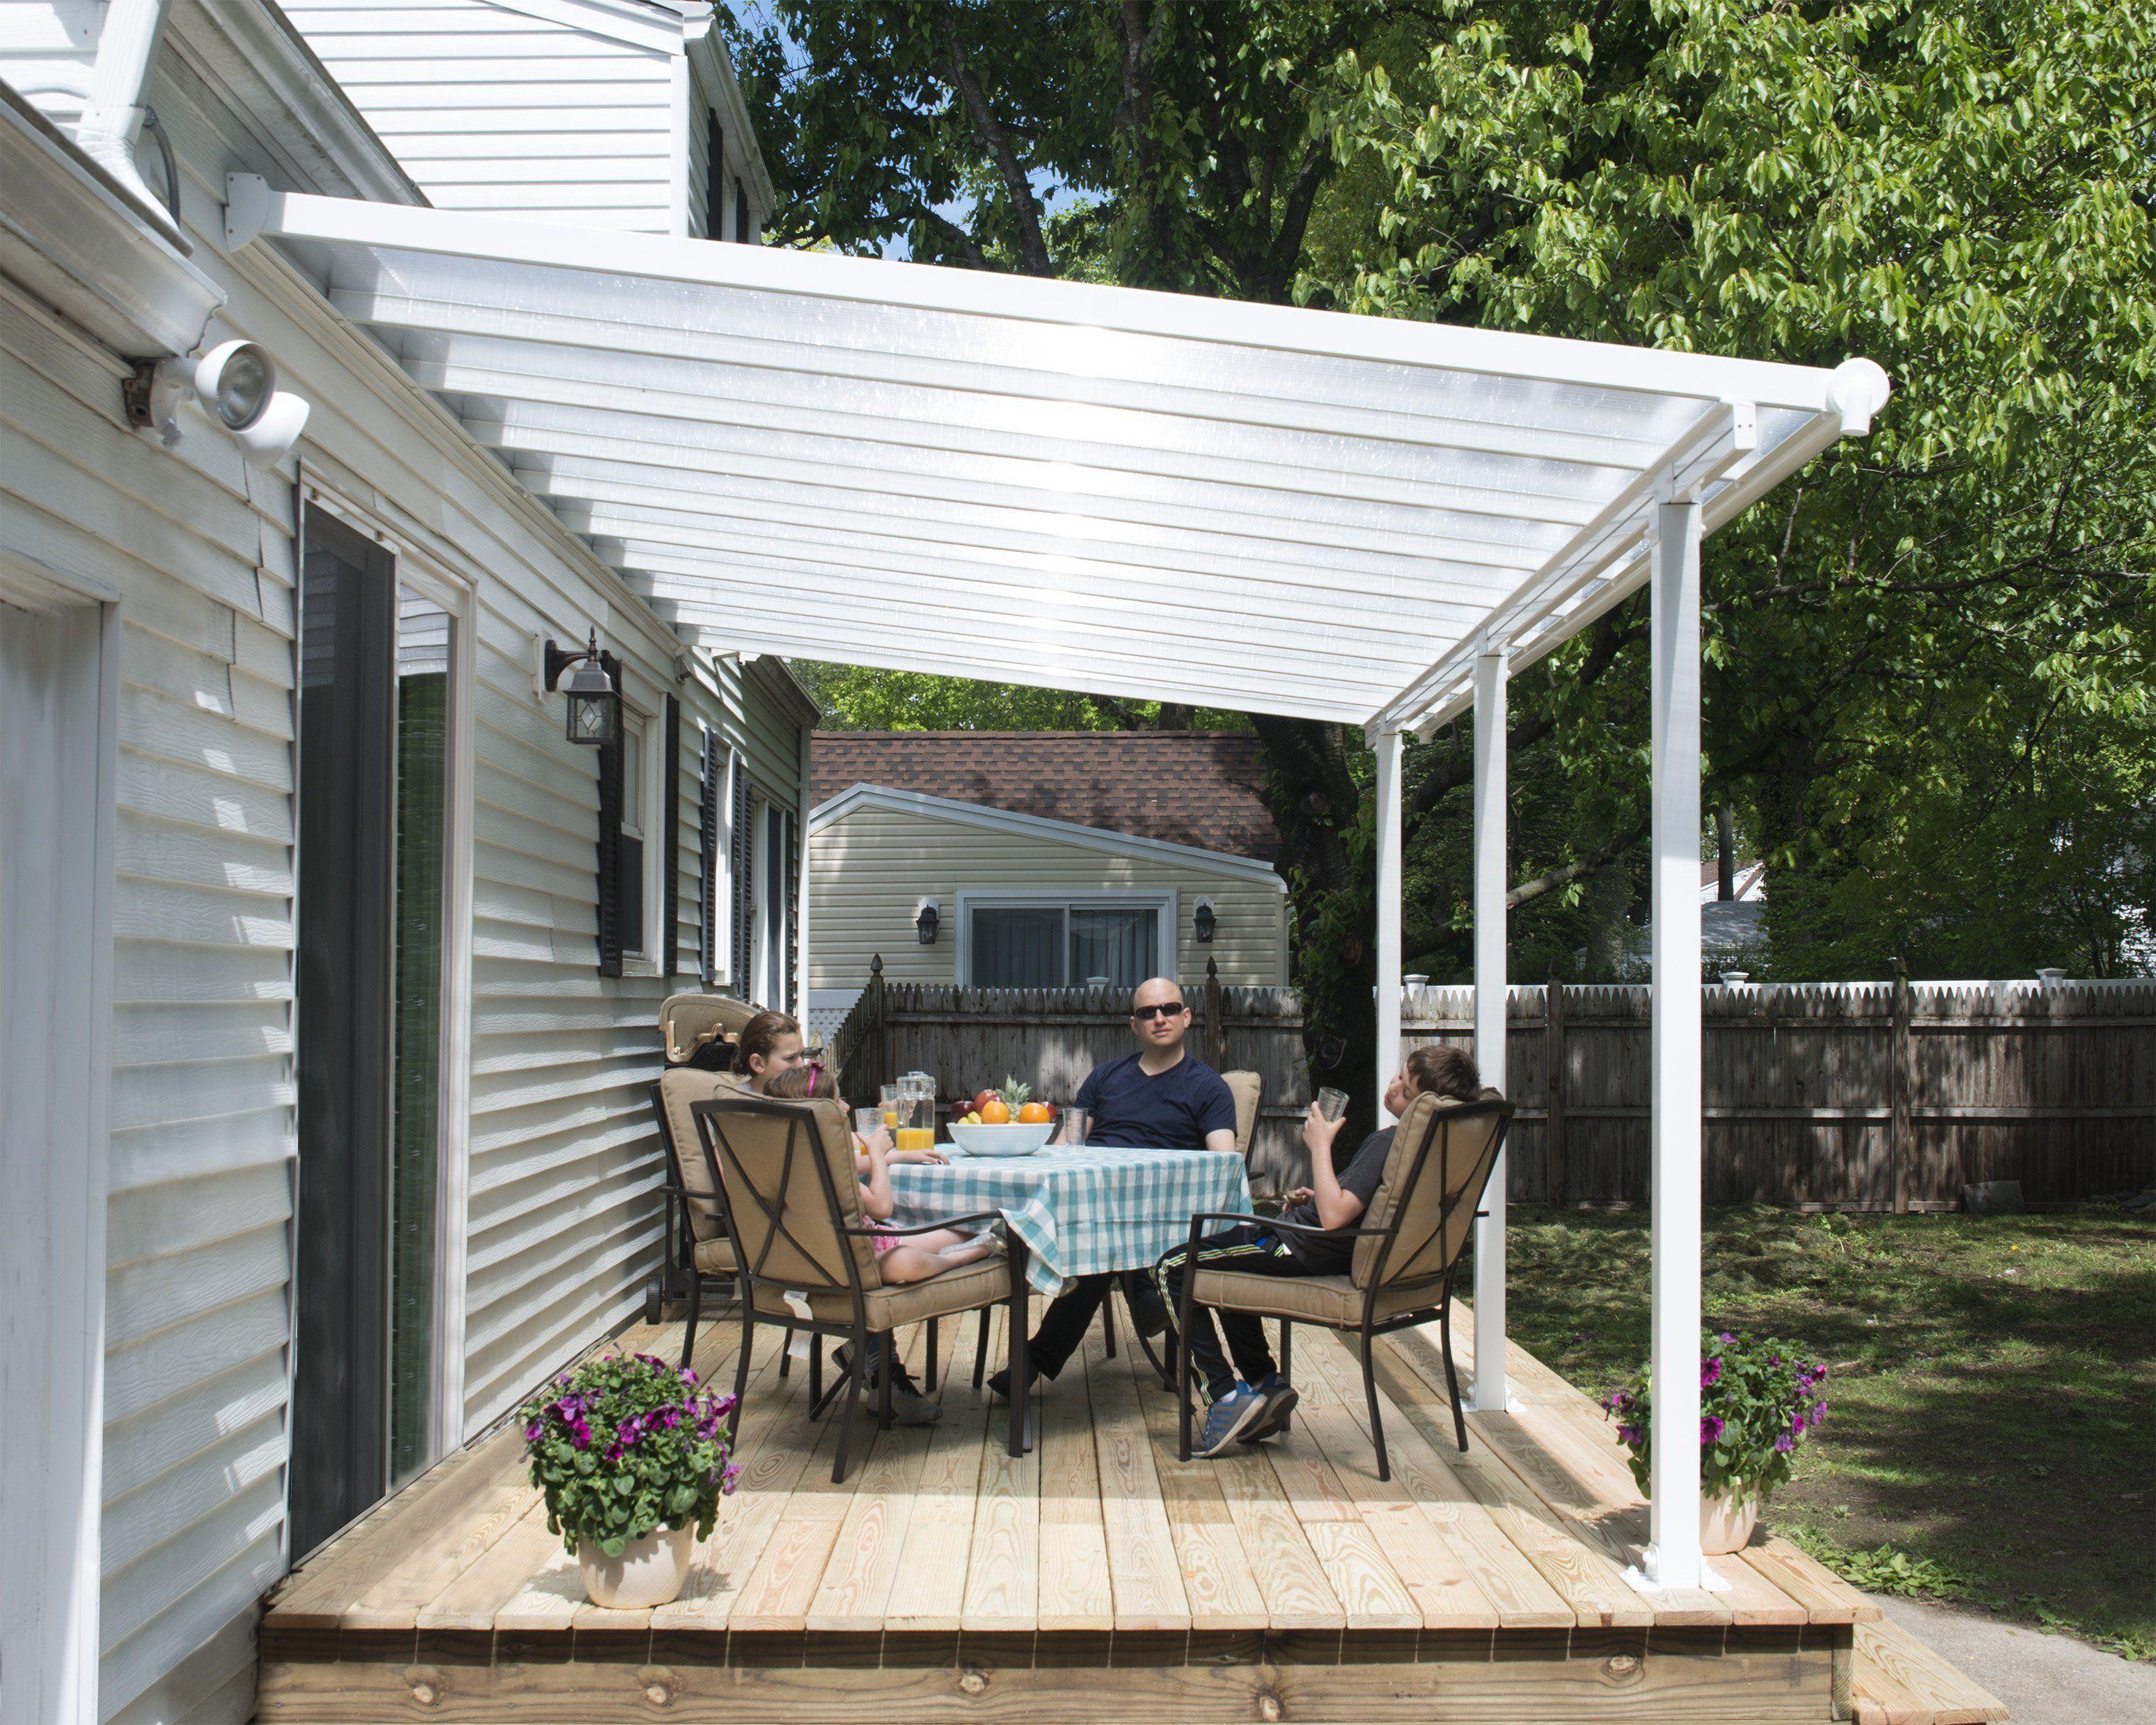 Pin On Gates Gazebos Sunshelters Saunas And Doors Top Picks